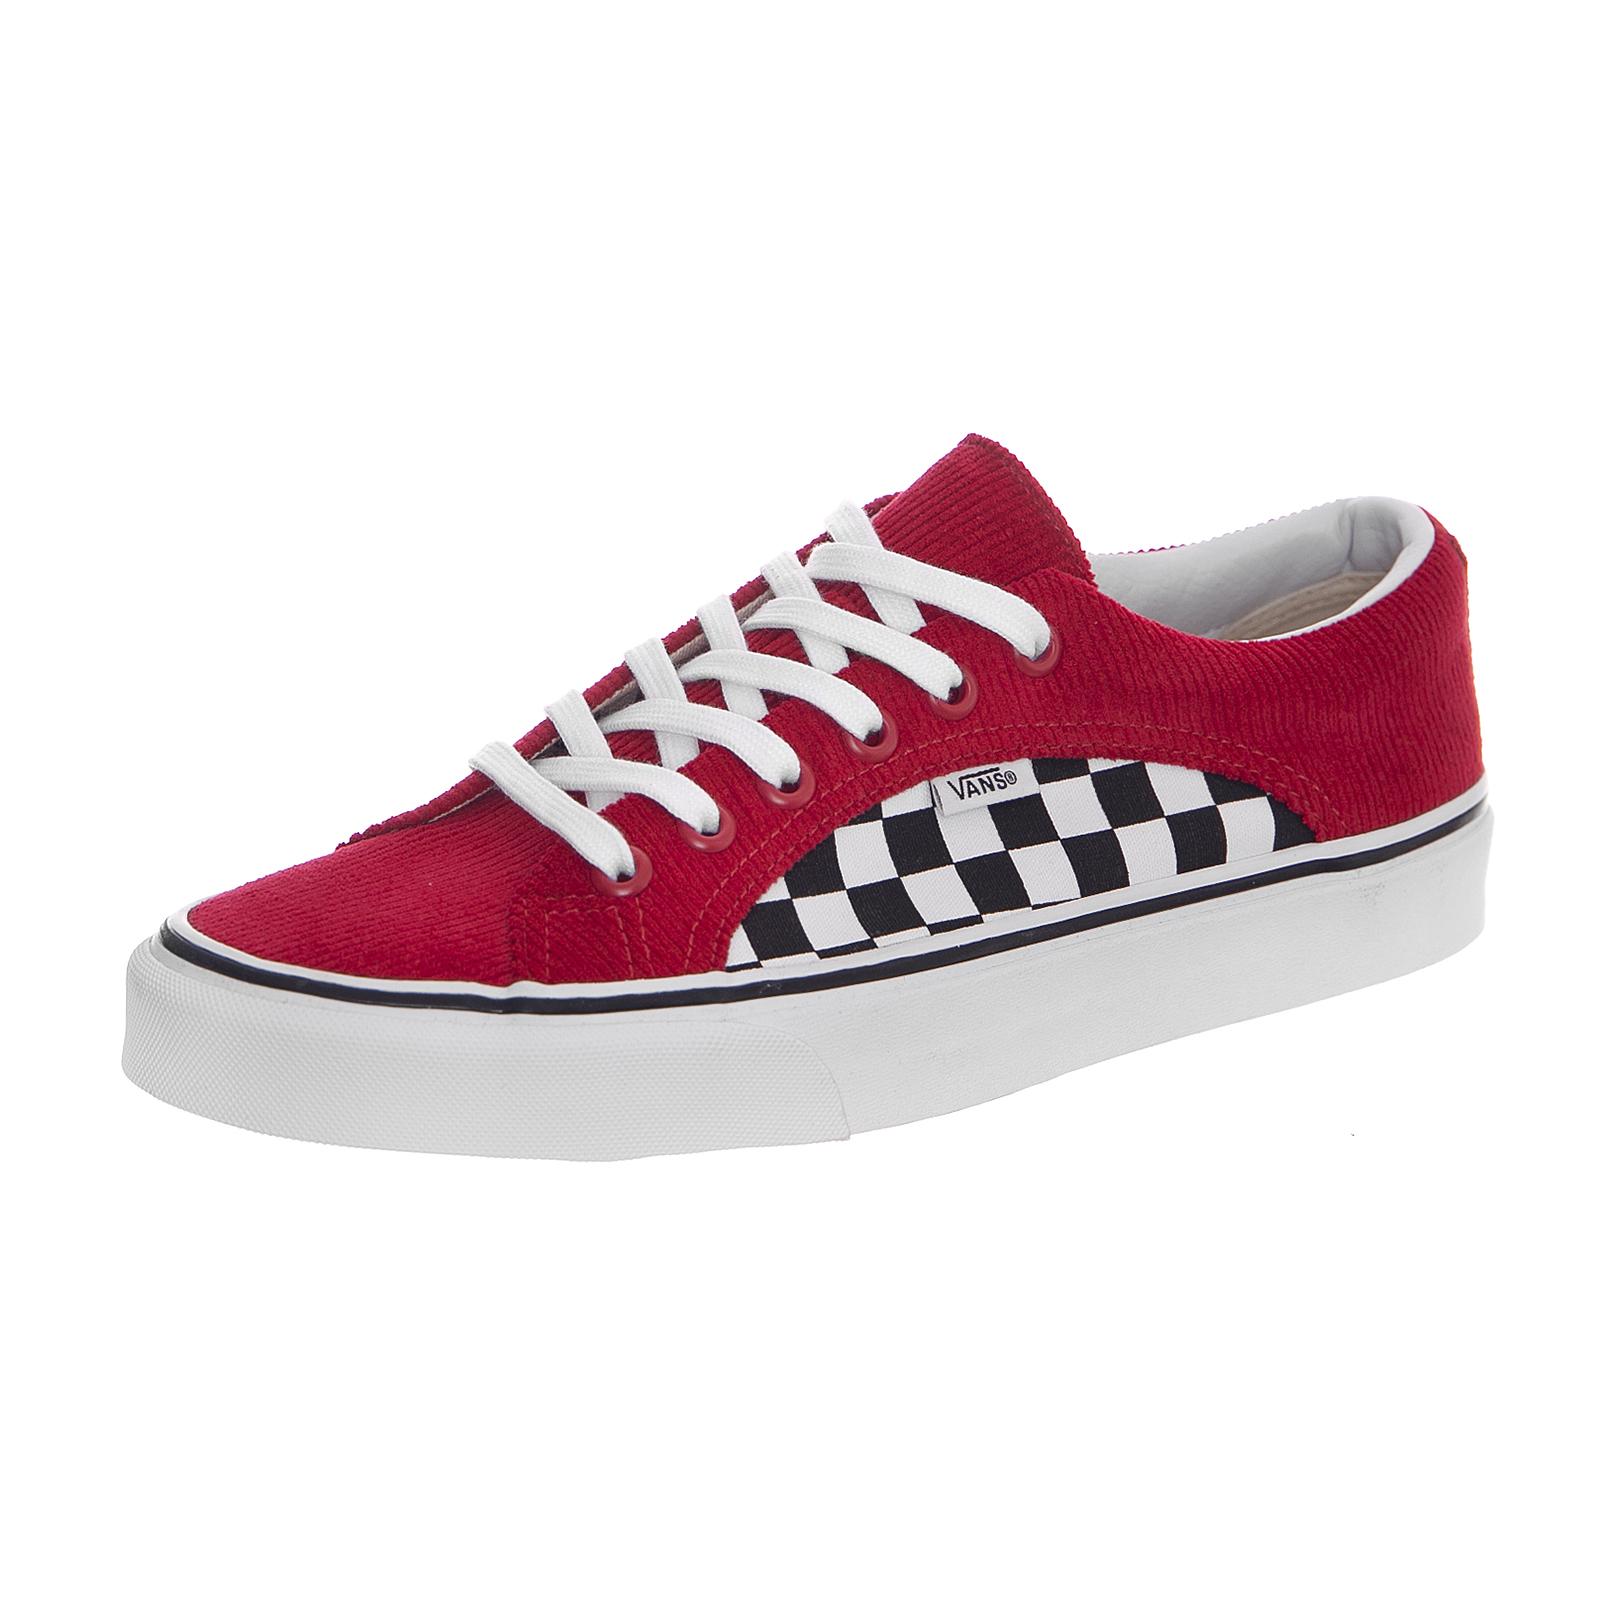 db64ddc816 Vans Sneakers Ua Lampin (Checker Cord) - Red True White Chekerboard ...